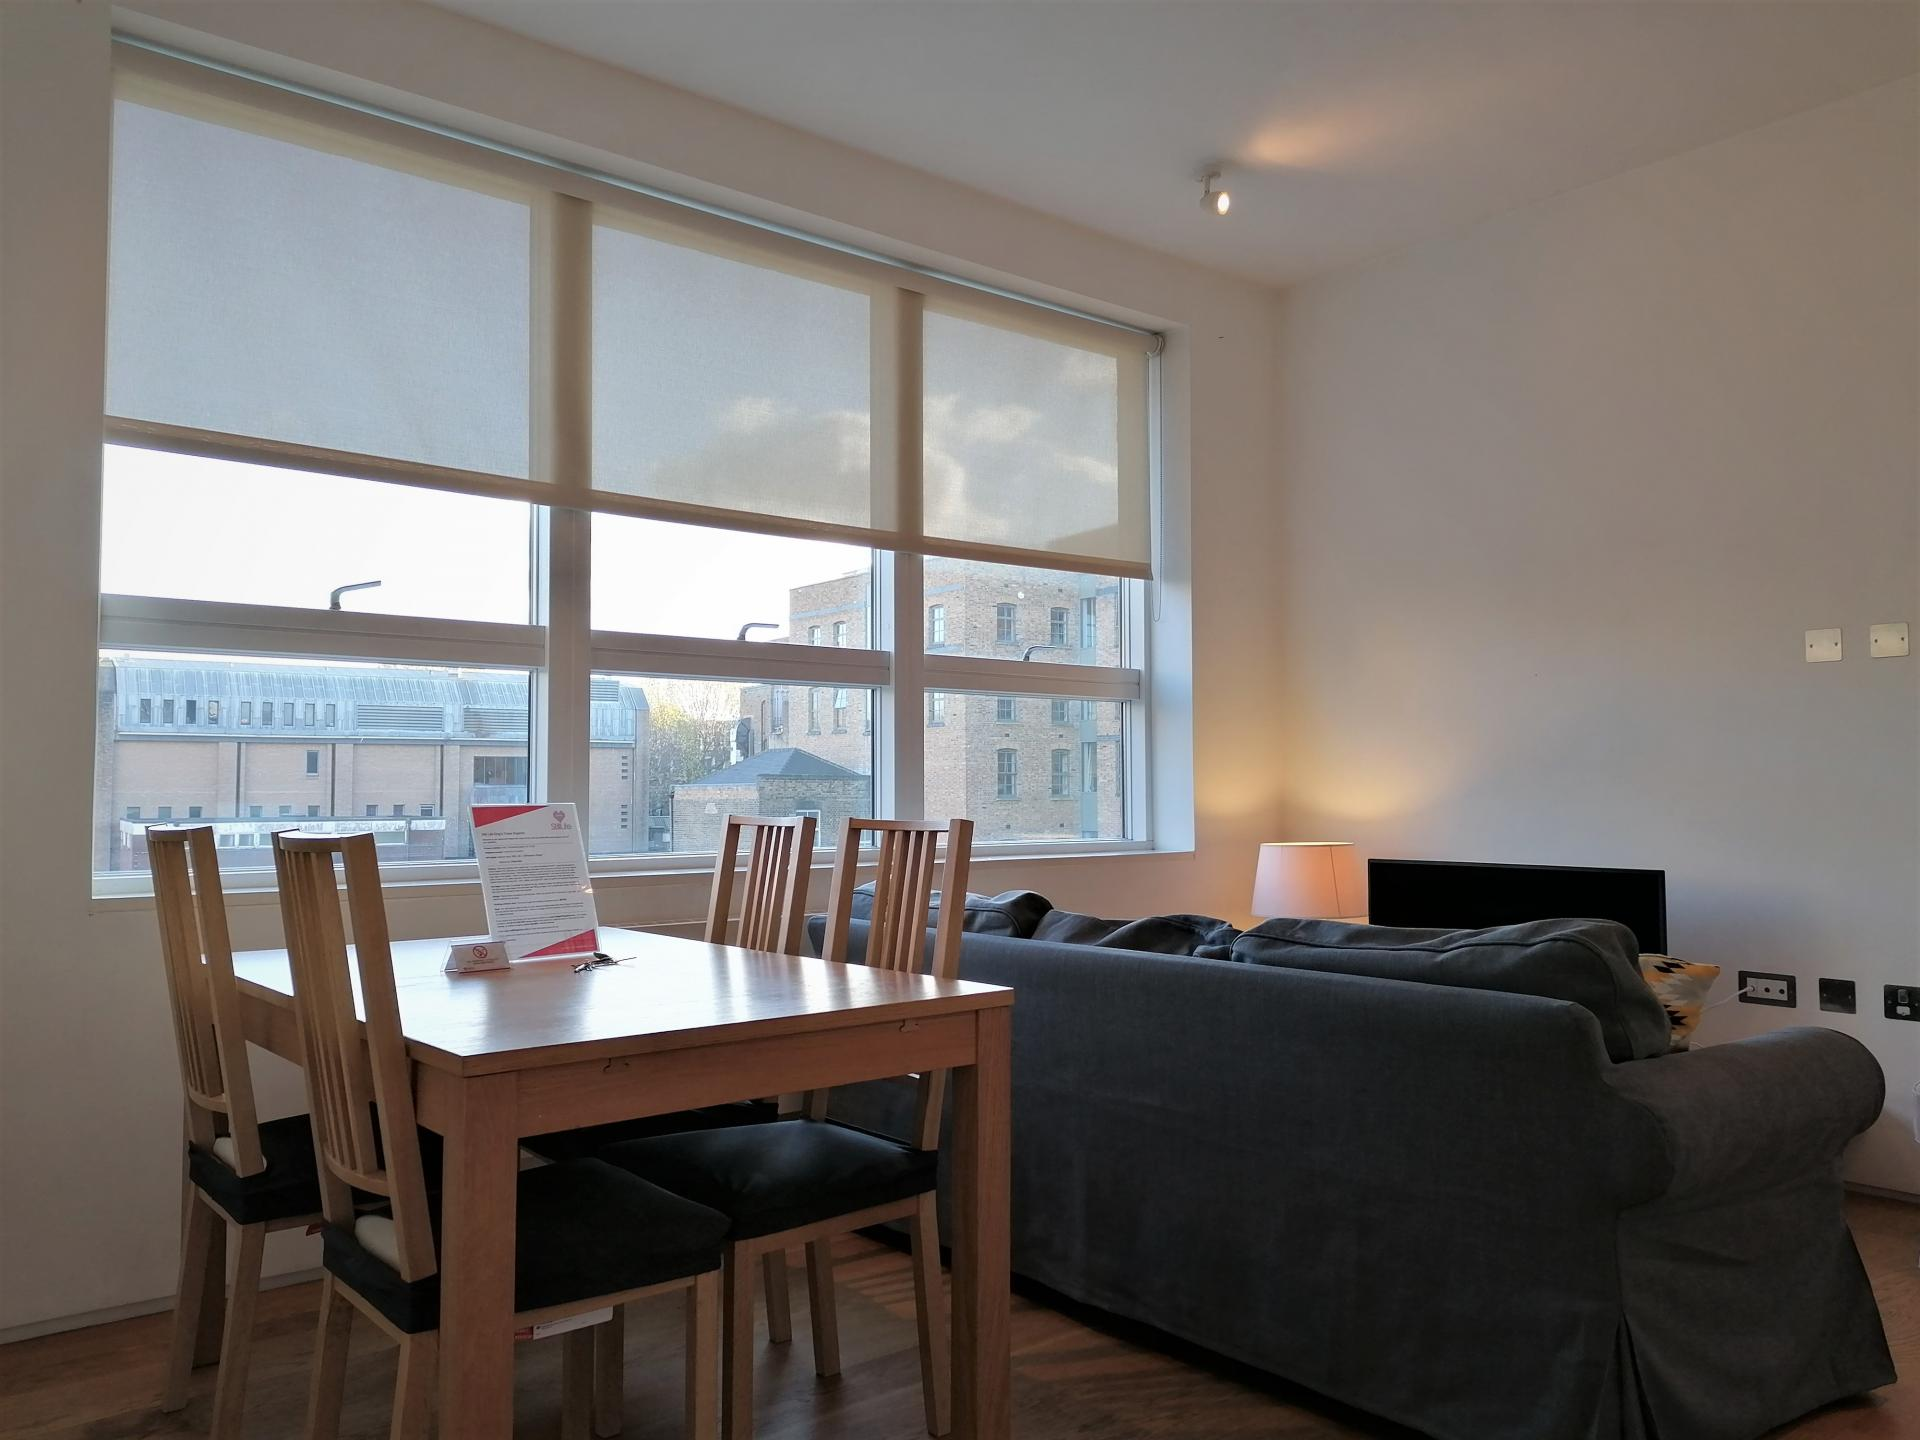 Living room at Still Life King's Cross Superior Apartment, Kings Cross St Pancras, London - Citybase Apartments